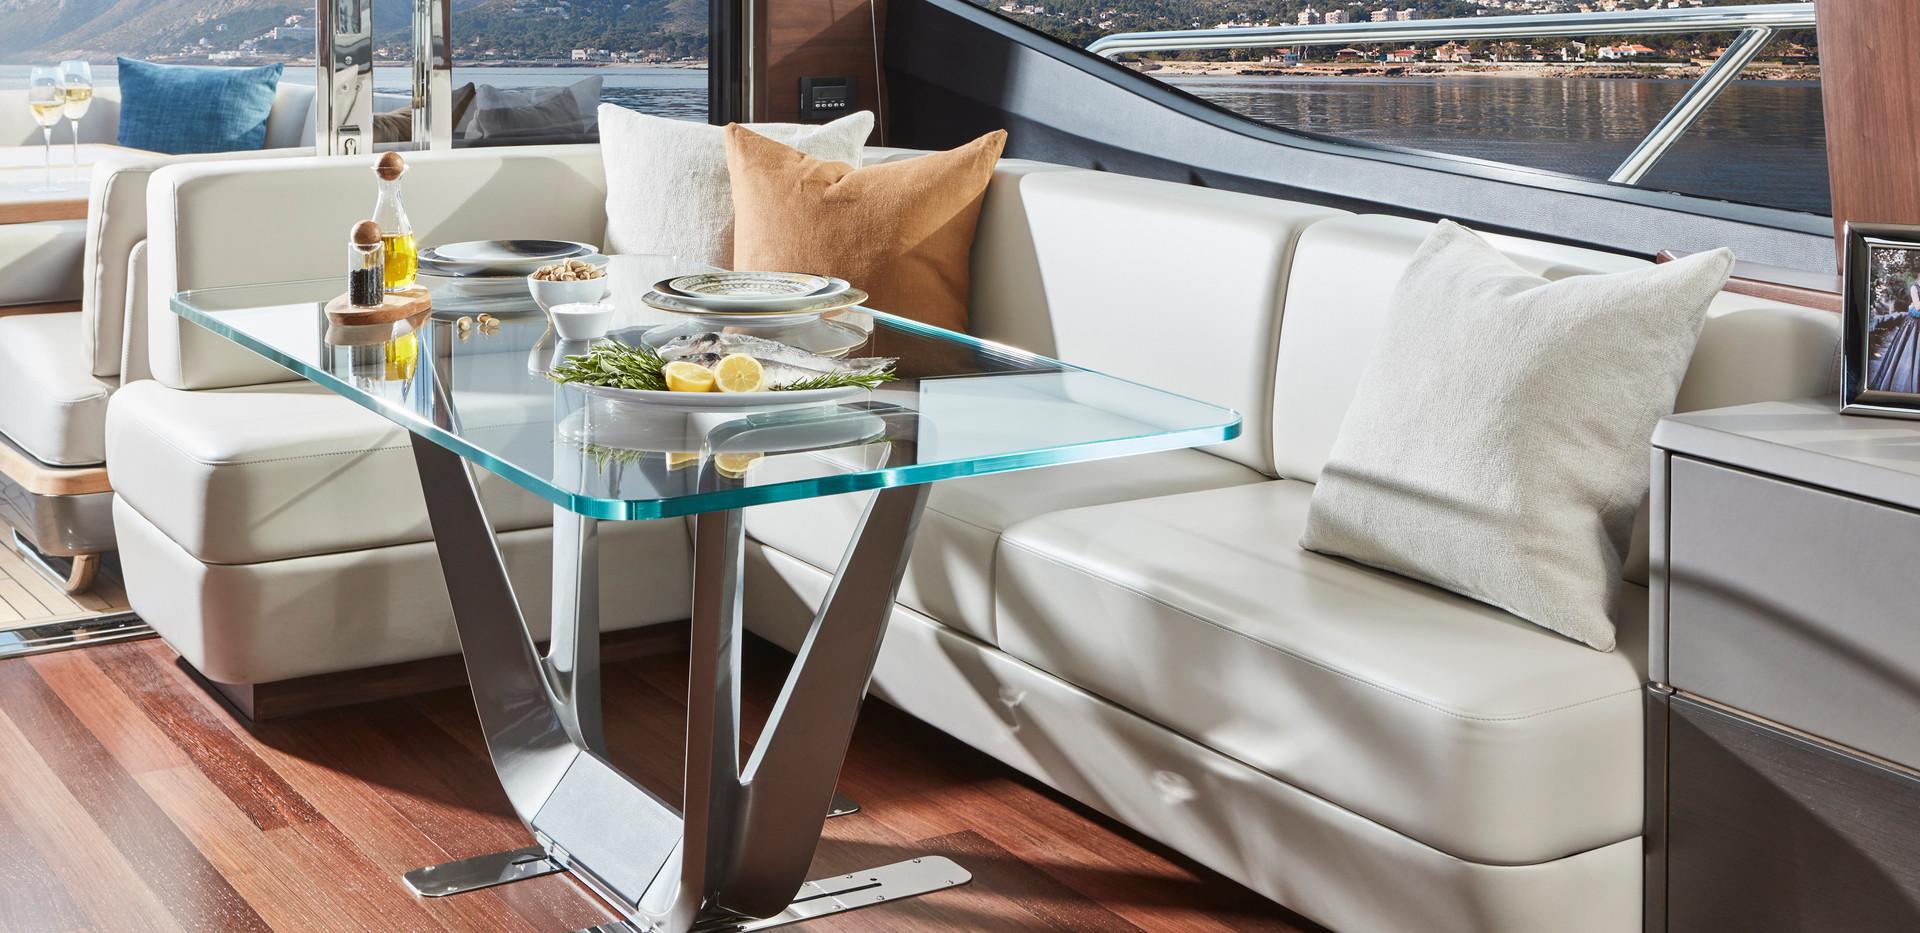 s78-interior-dining-areaAbromowitz Sharp